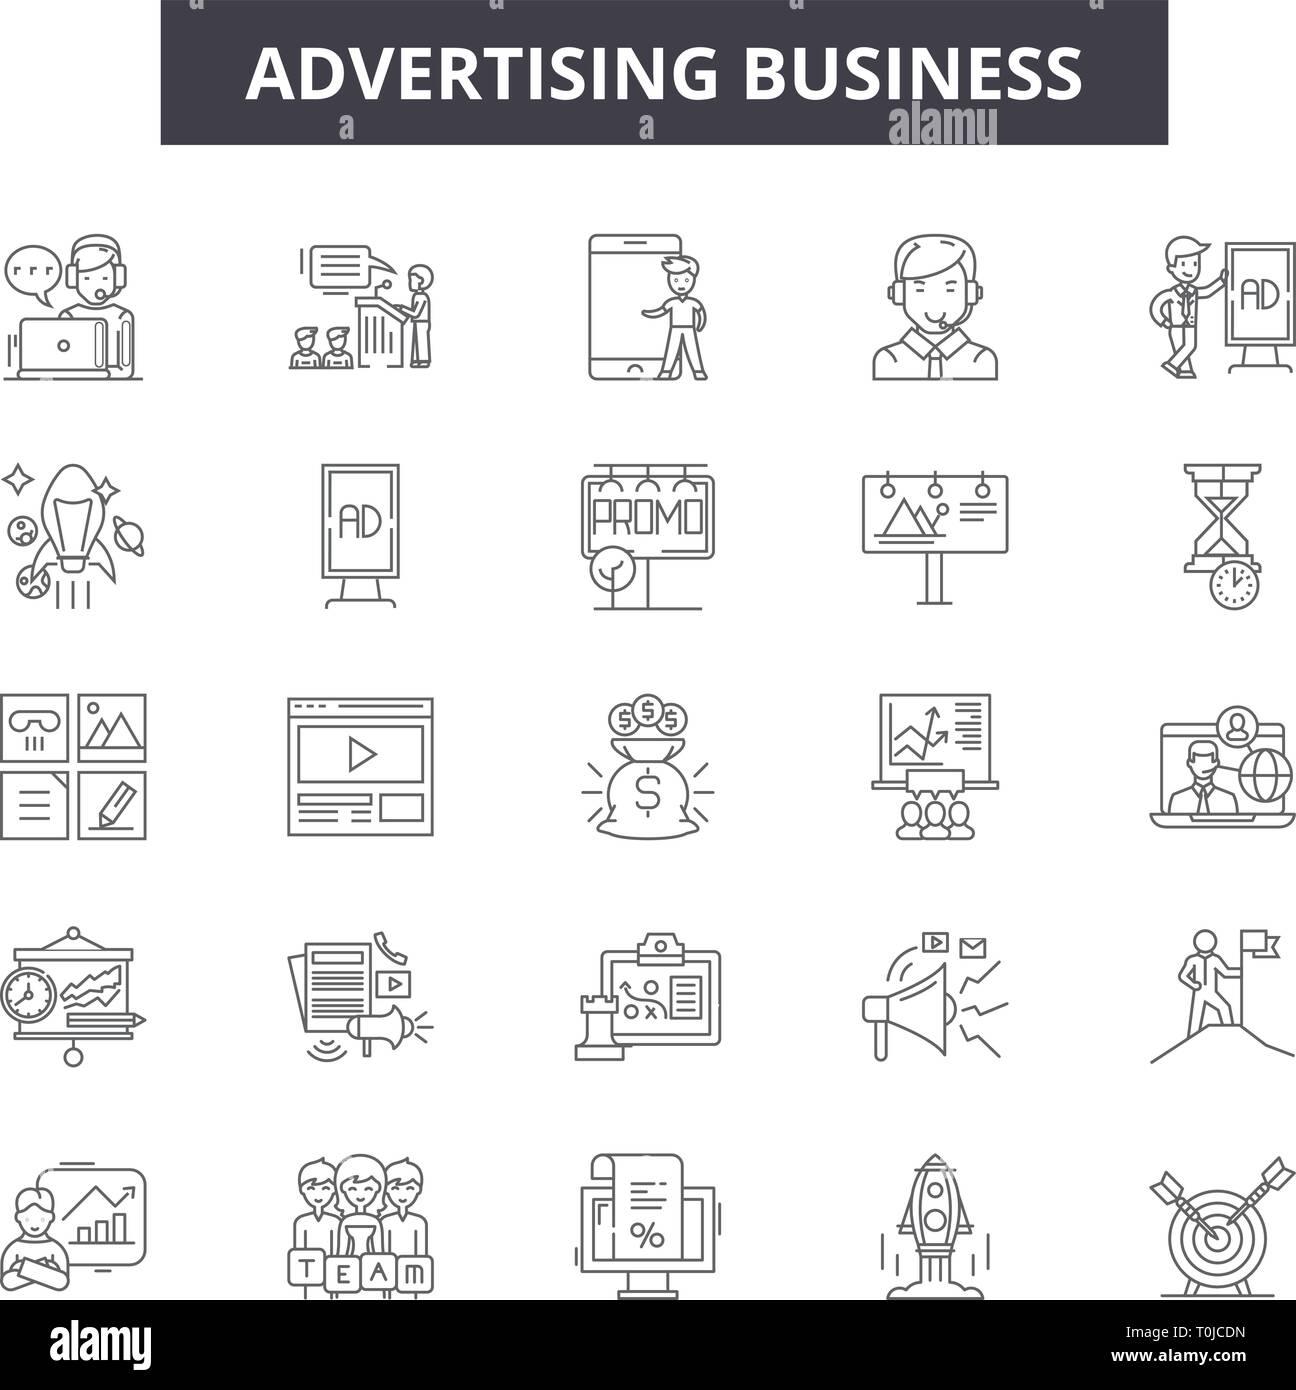 Advertising Marketing Stock Photos & Advertising Marketing Stock